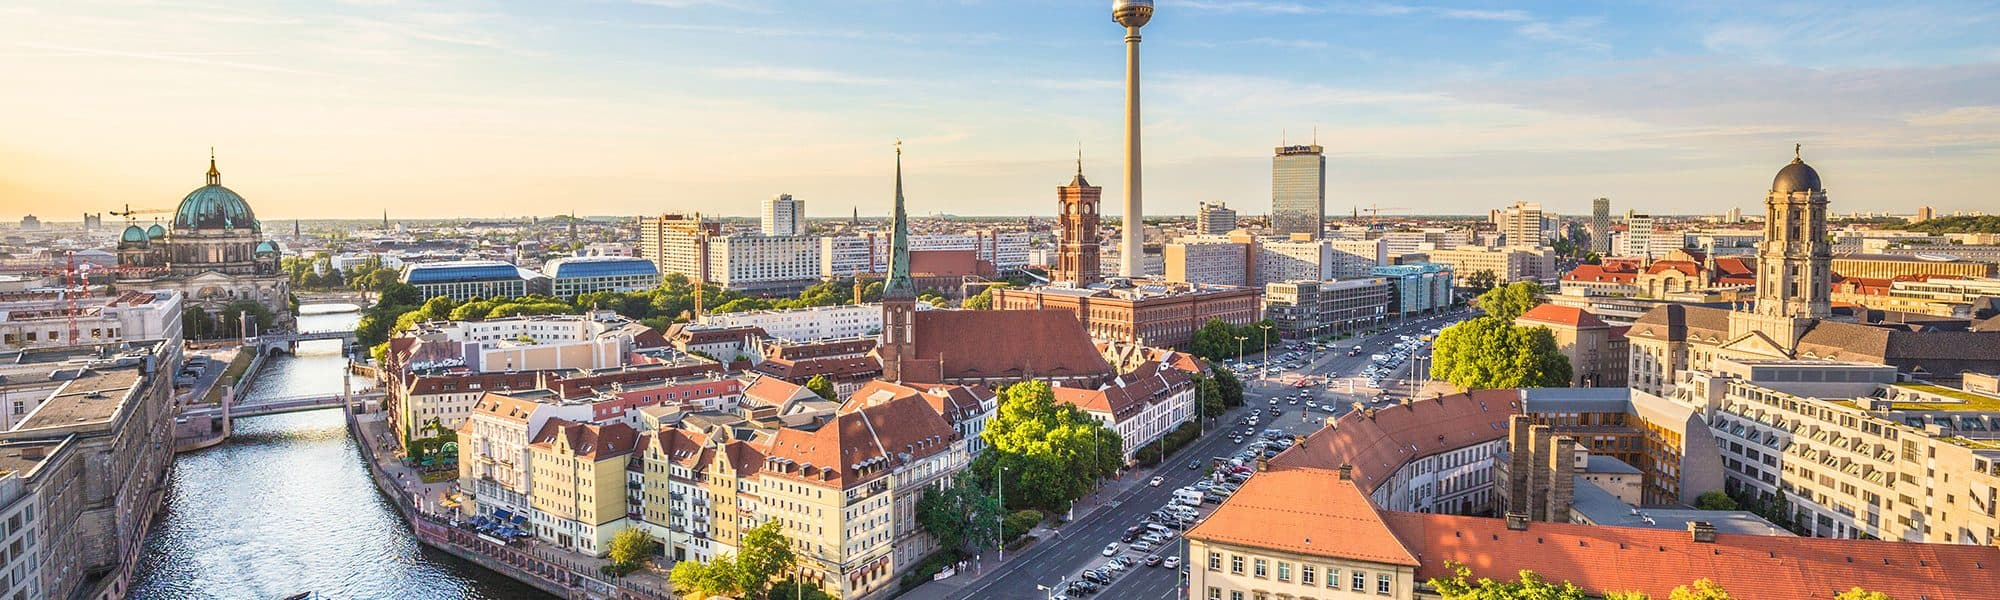 Engineering & IT Personalvermittlung Berlin | MEYHEADHUNTER